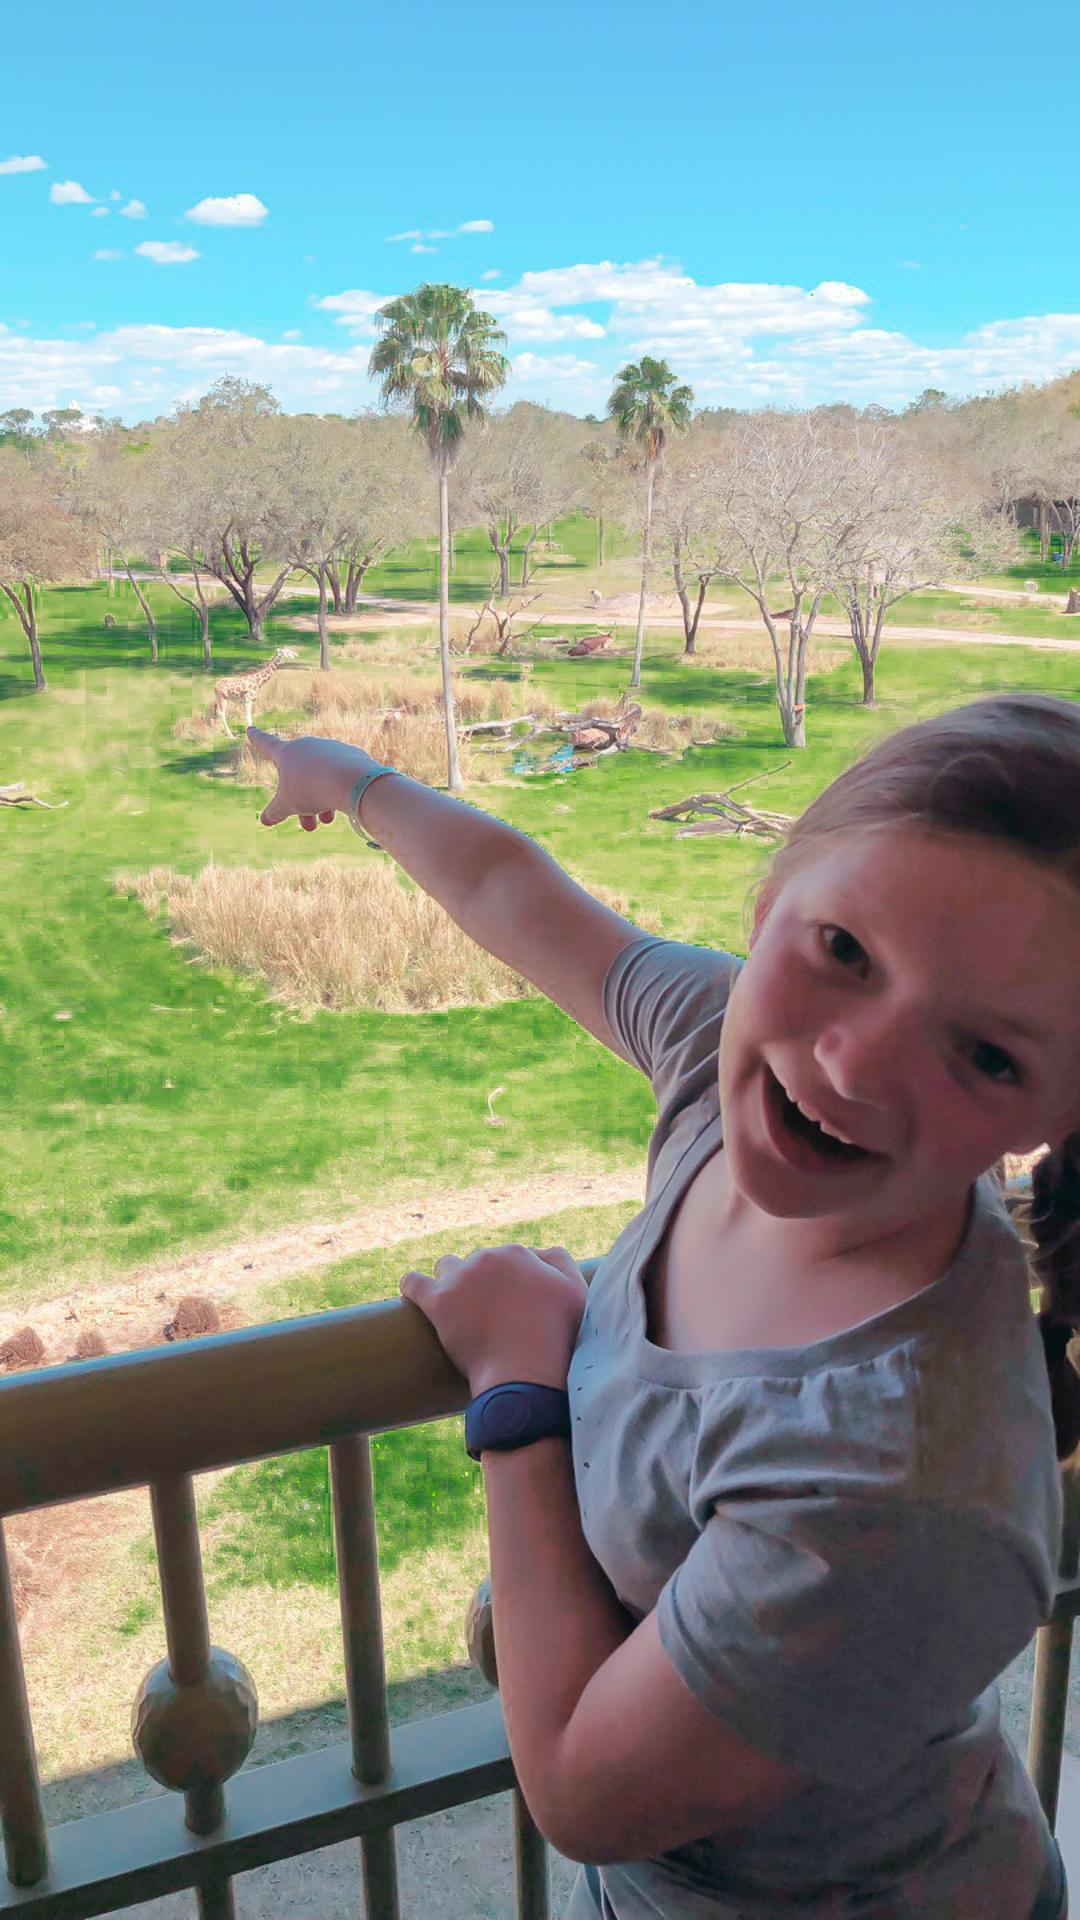 Girl on the balcony pointing at a giraffe at the Animal Kingdom Lodge at Walt Disney World